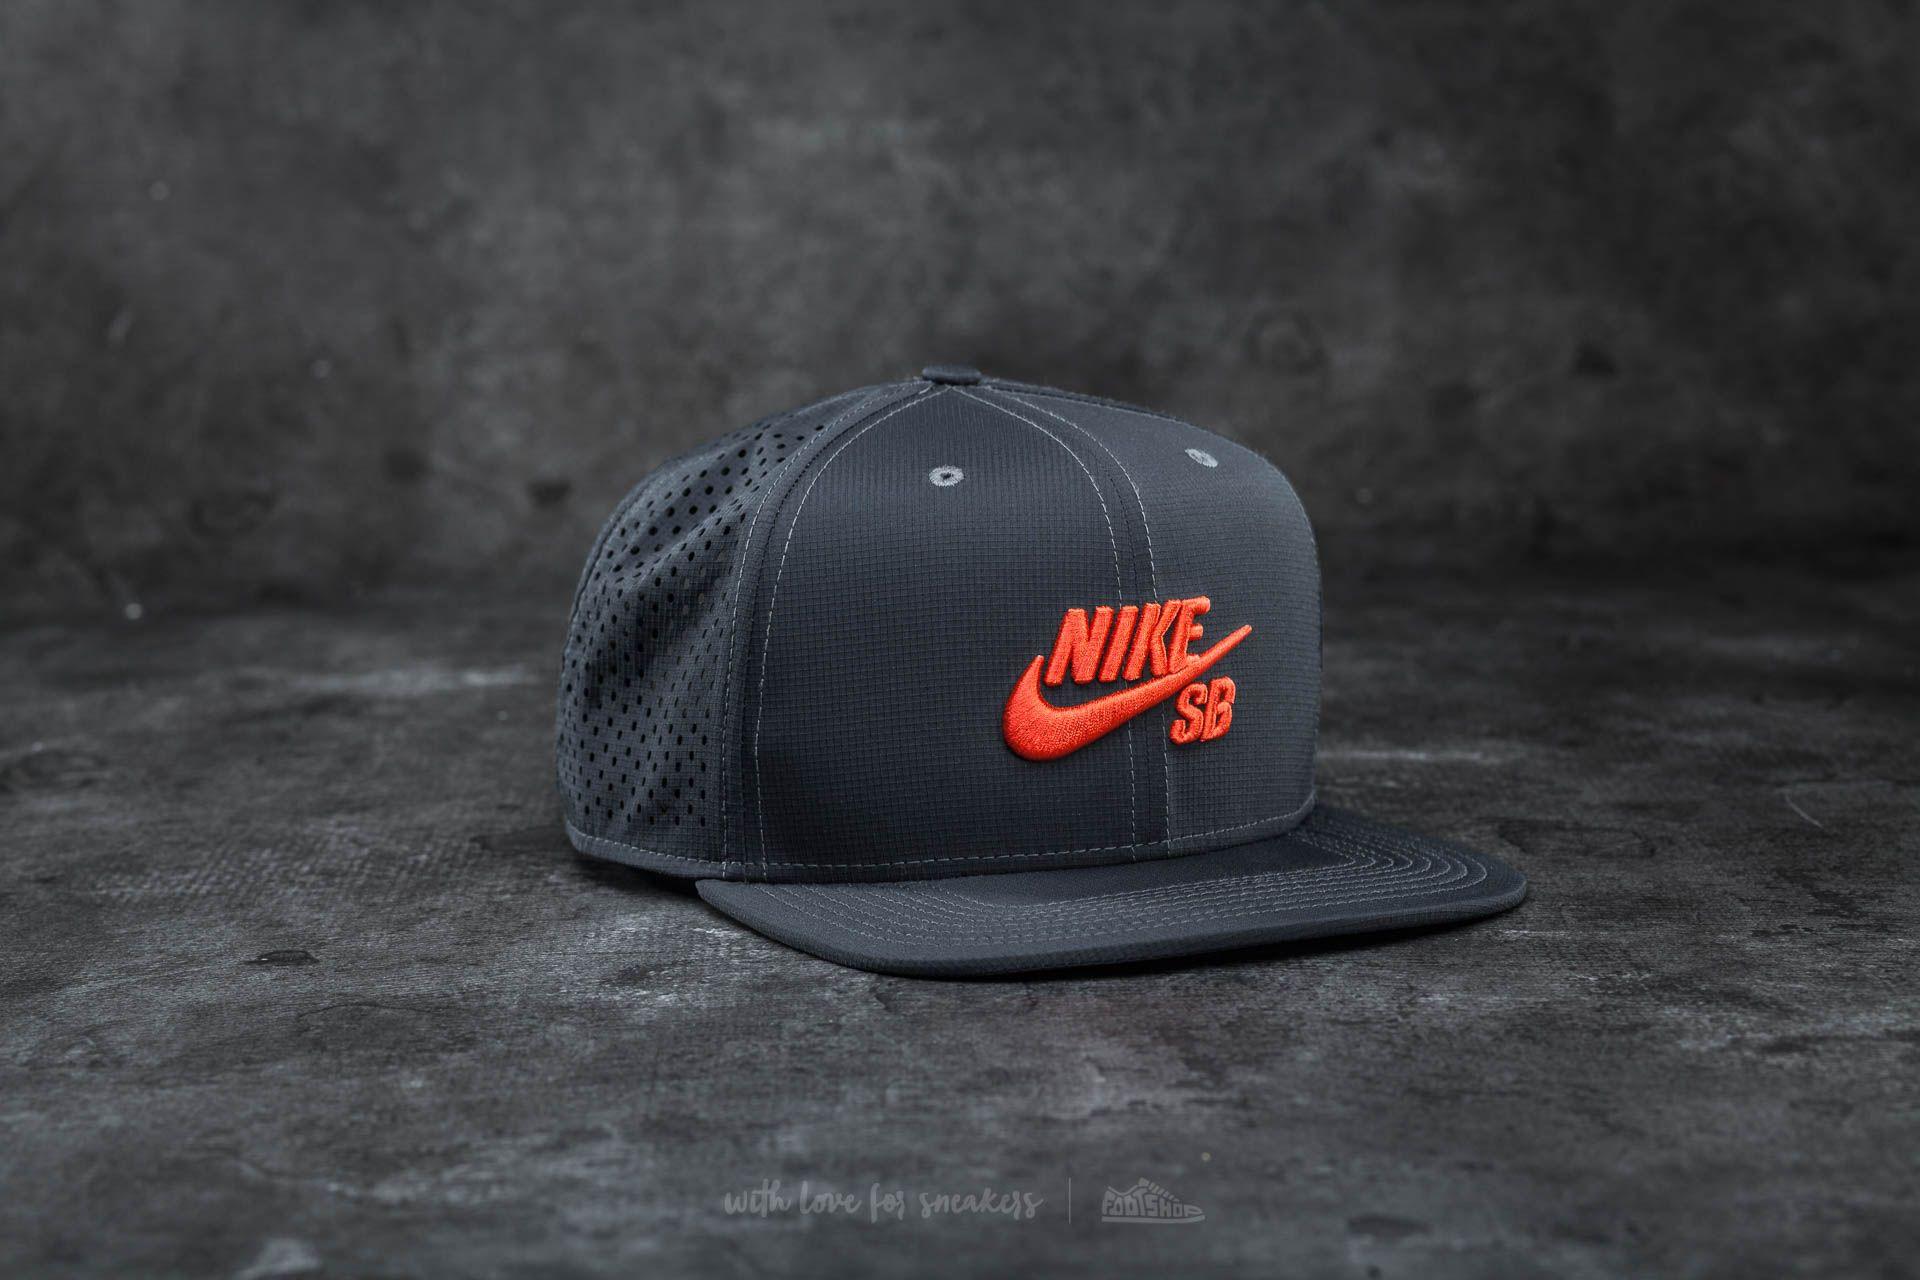 Nike SB Performance Trucker Hat Anthracite/ Black/ Max Orange - 14693